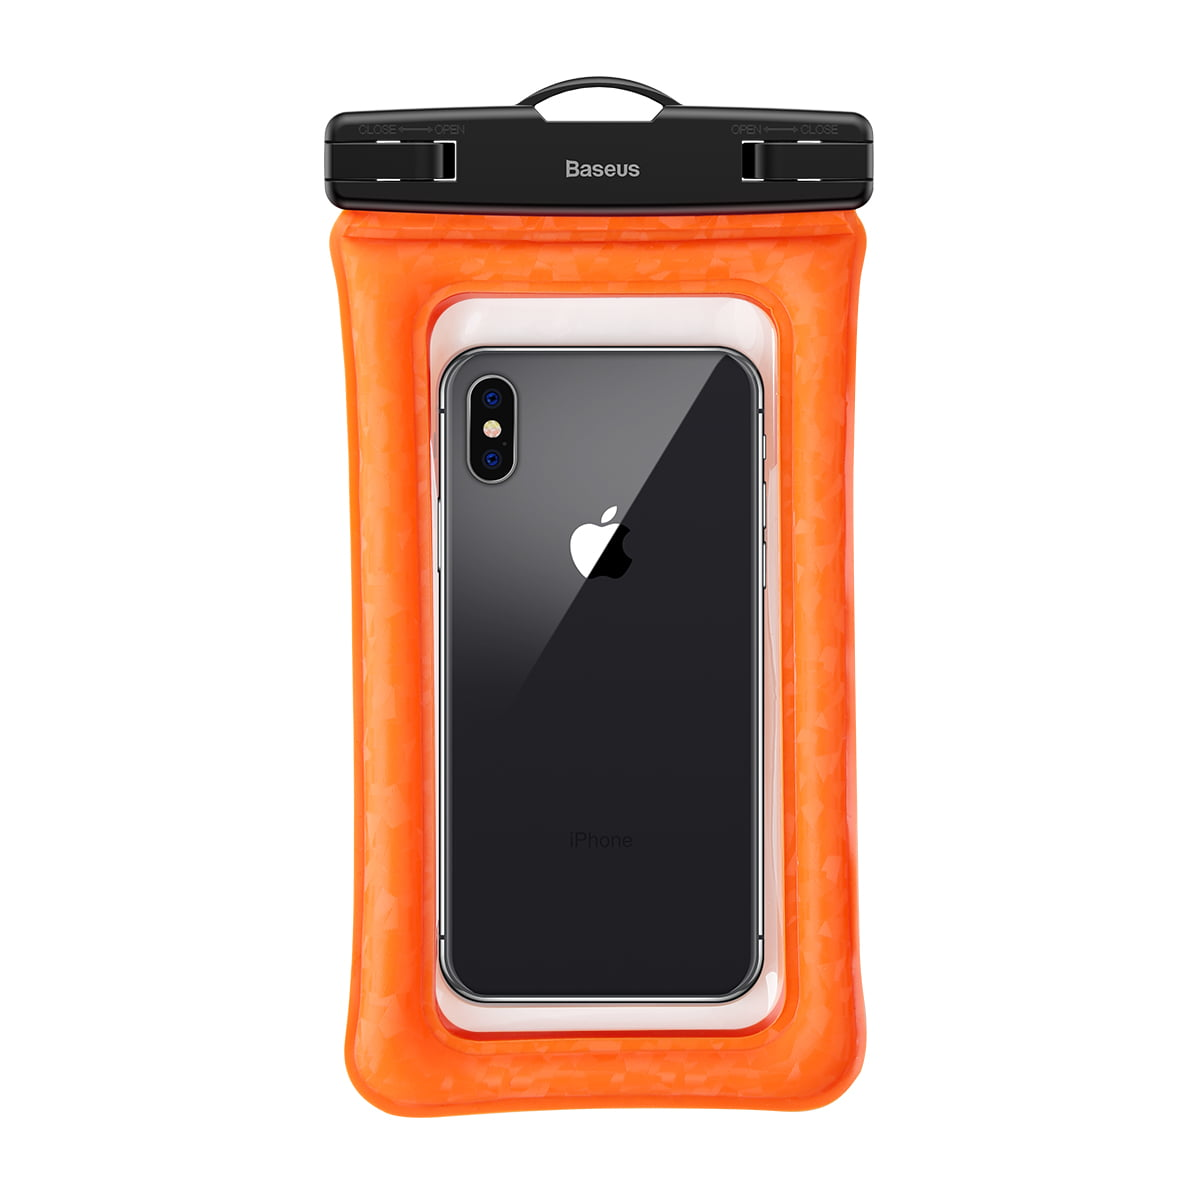 baseus-vandtaet-etui-orange-ergosport-8